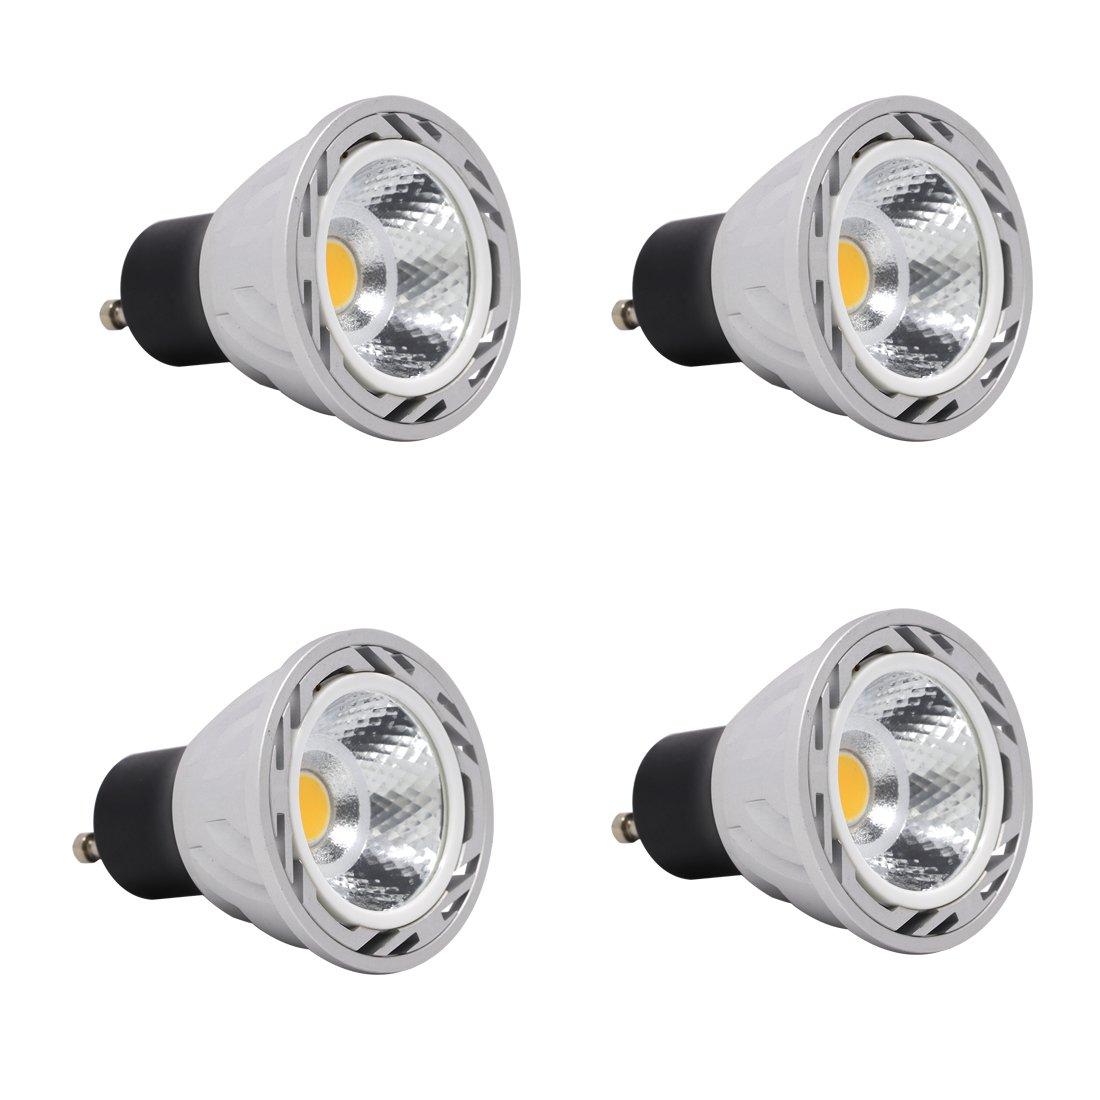 Ulight GU10 led Light Bulbs 5W 120V 550lm CRI 85, 50W Halogen Bulb Equivalent, for Track Lighting or recessed Light-Pack of 4 (Warm Whtie 2700K)